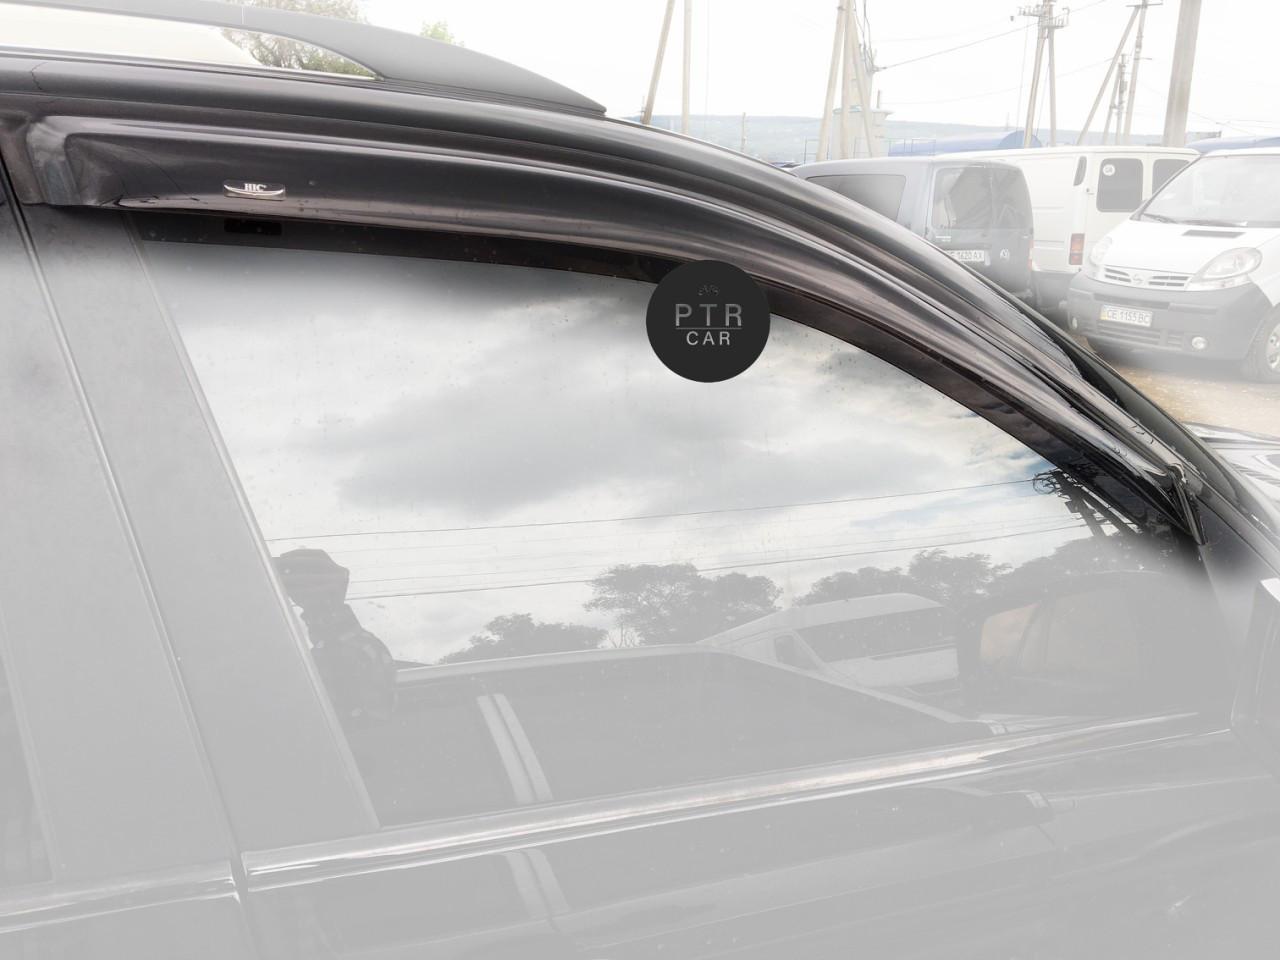 Дефлекторы окон (ветровики) Audi A6 2000-2012 (C5.4B)Allroad/ Avant 1997-2004 4шт HIC